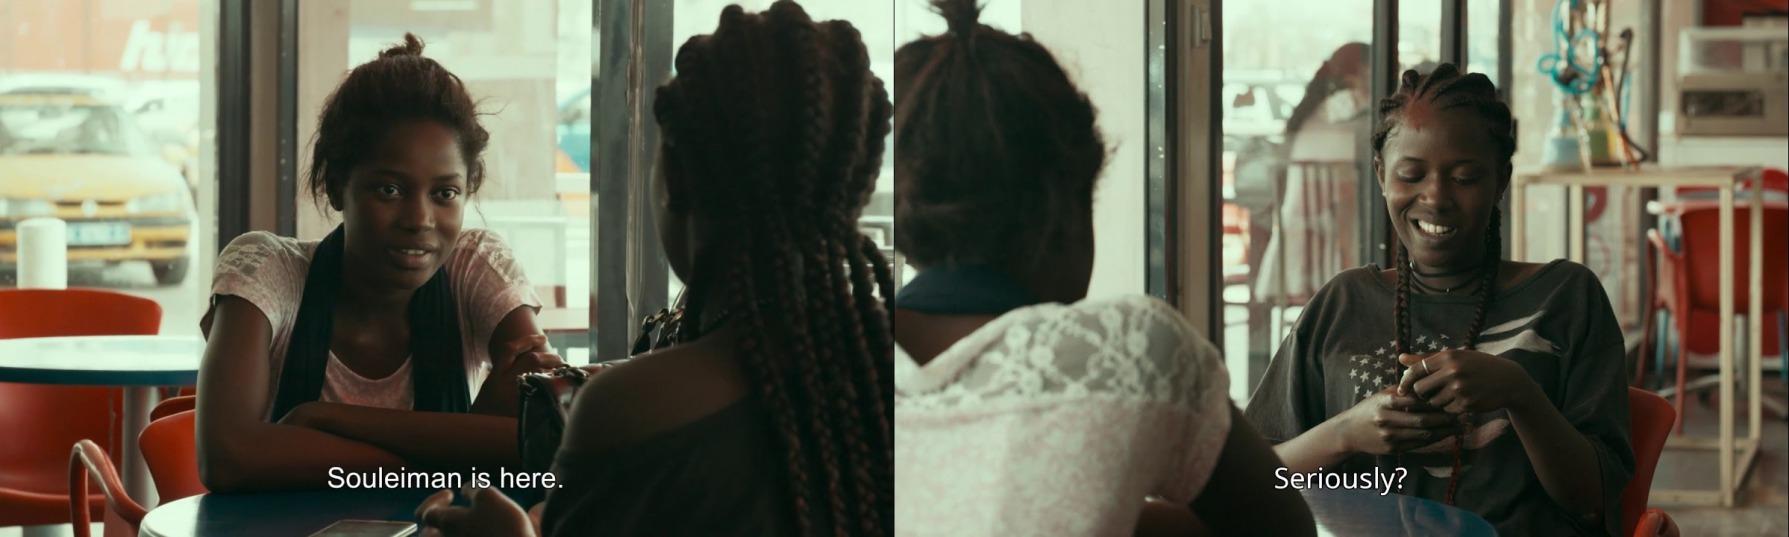 Atlantique (2019) crítica